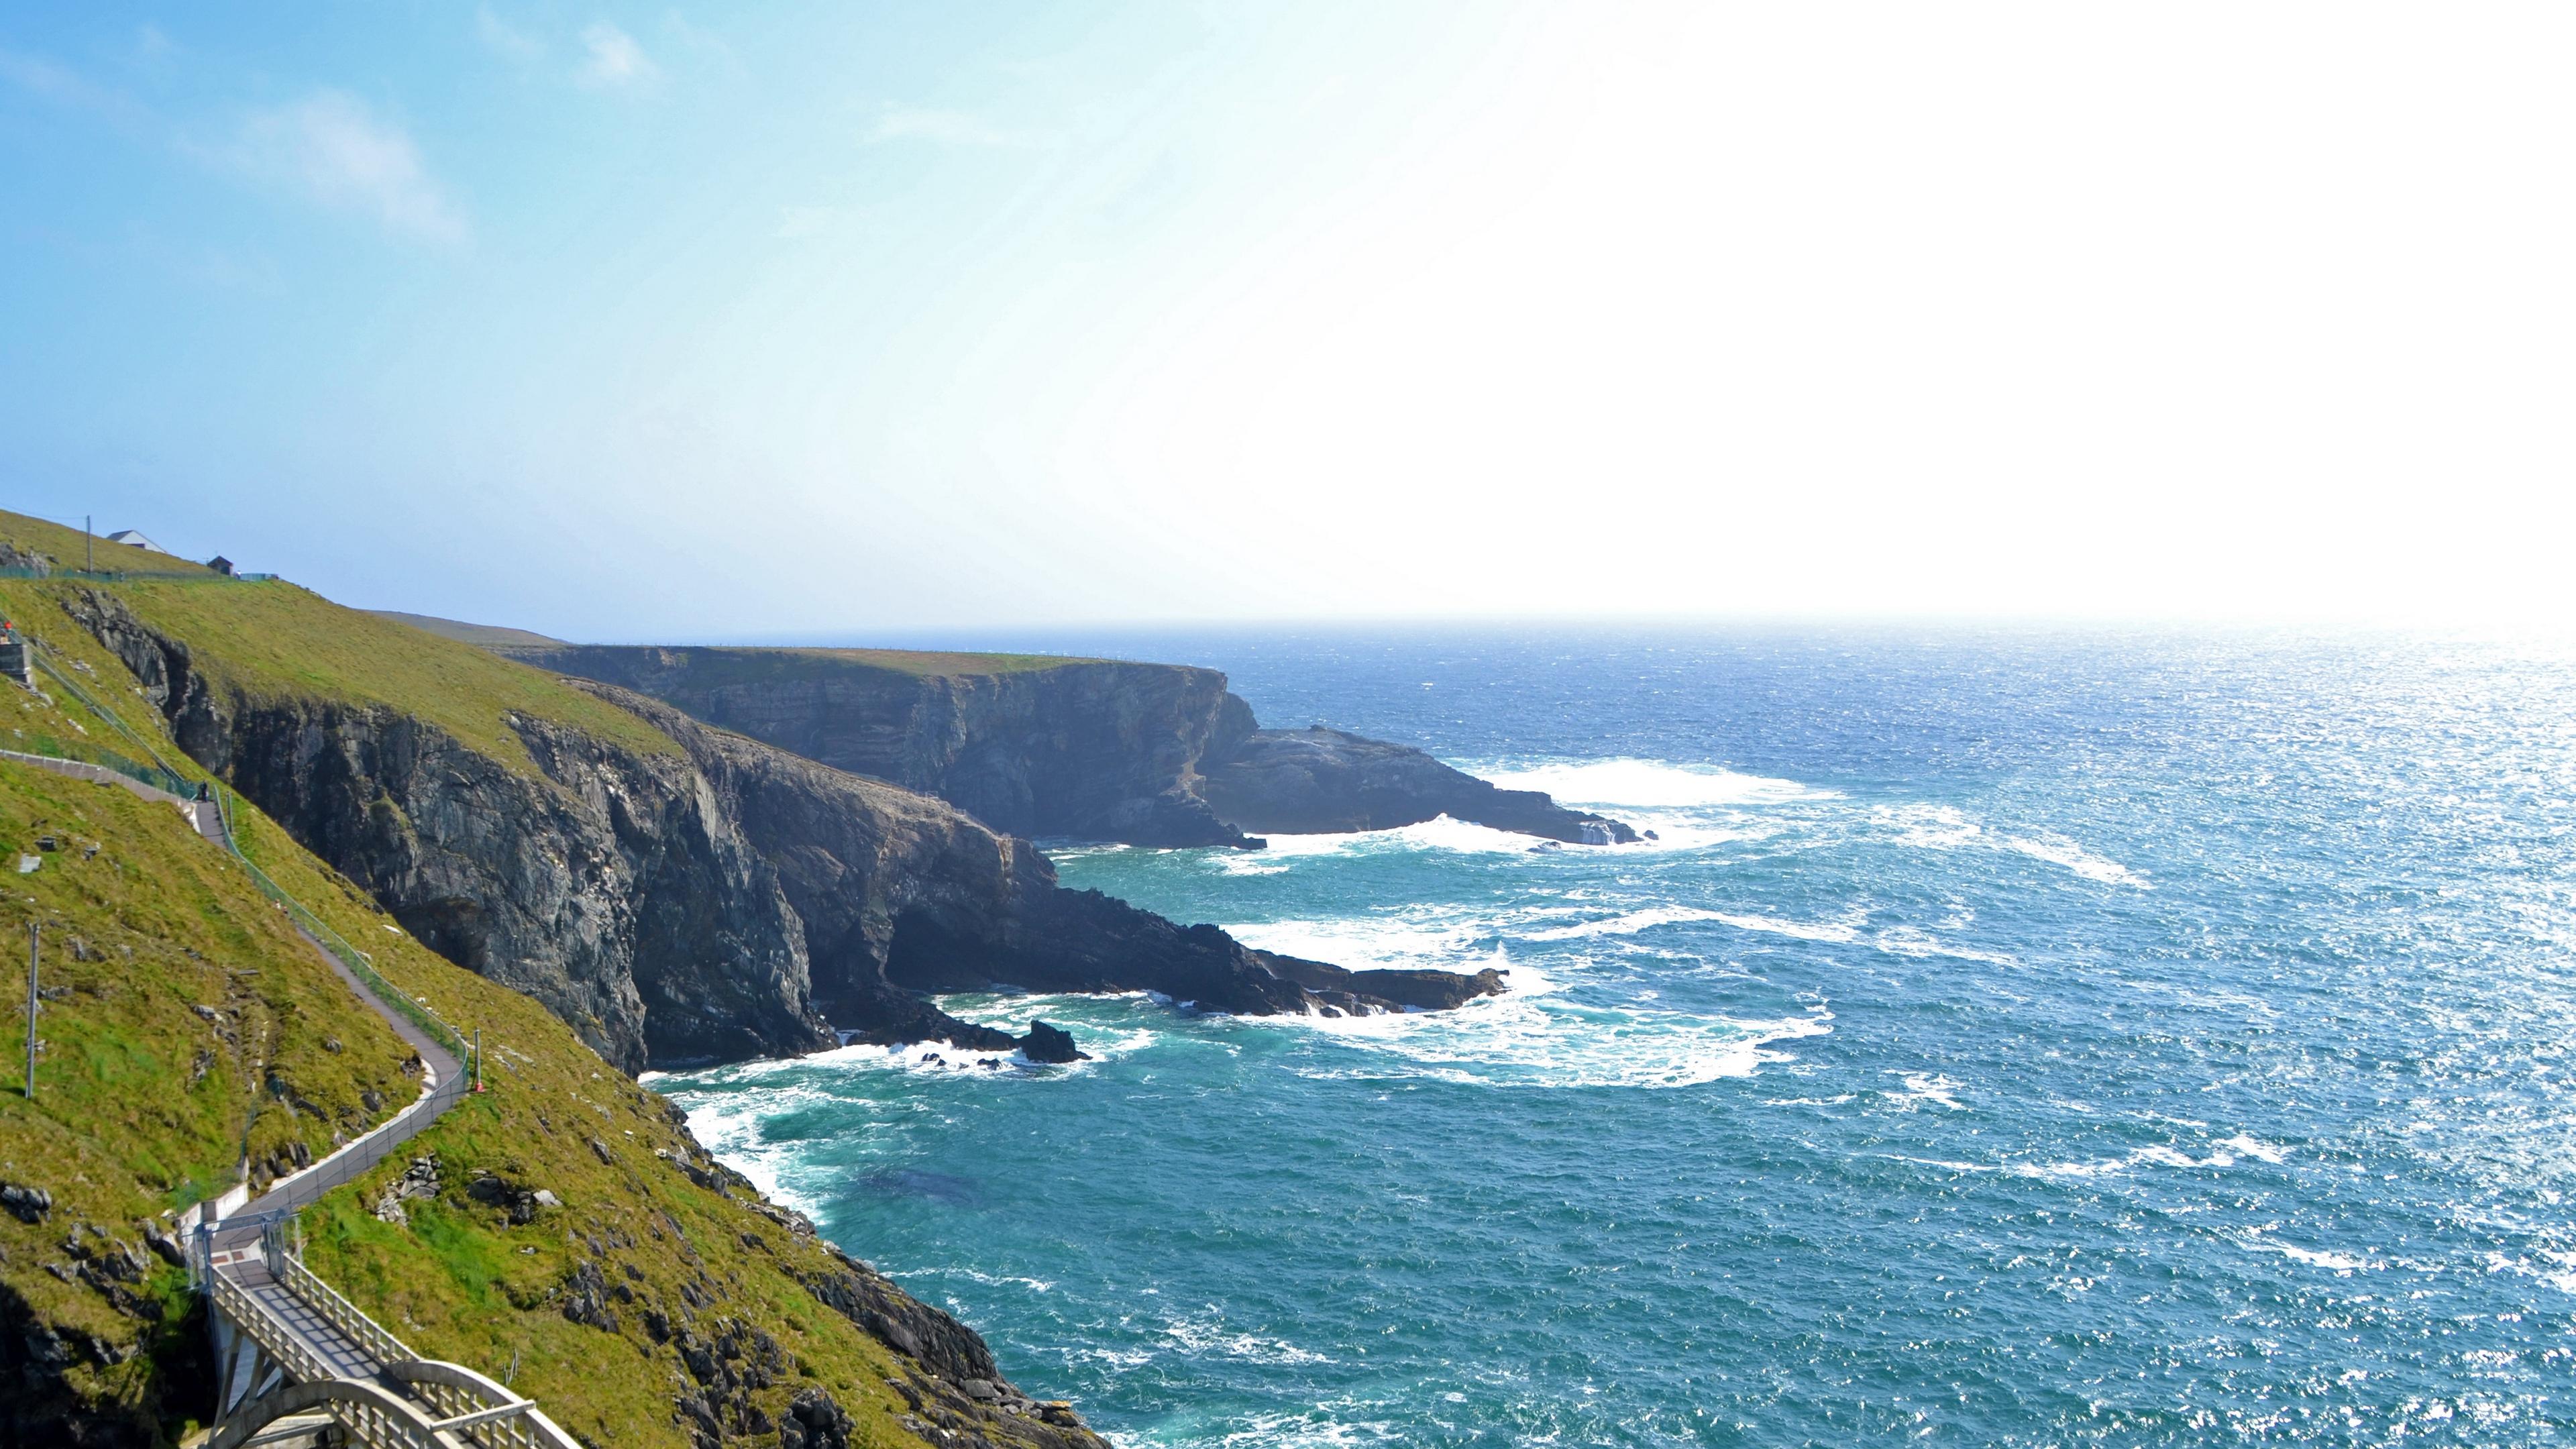 ireland beach coast 4k 1541117802 - ireland, beach, coast 4k - Ireland, Coast, Beach